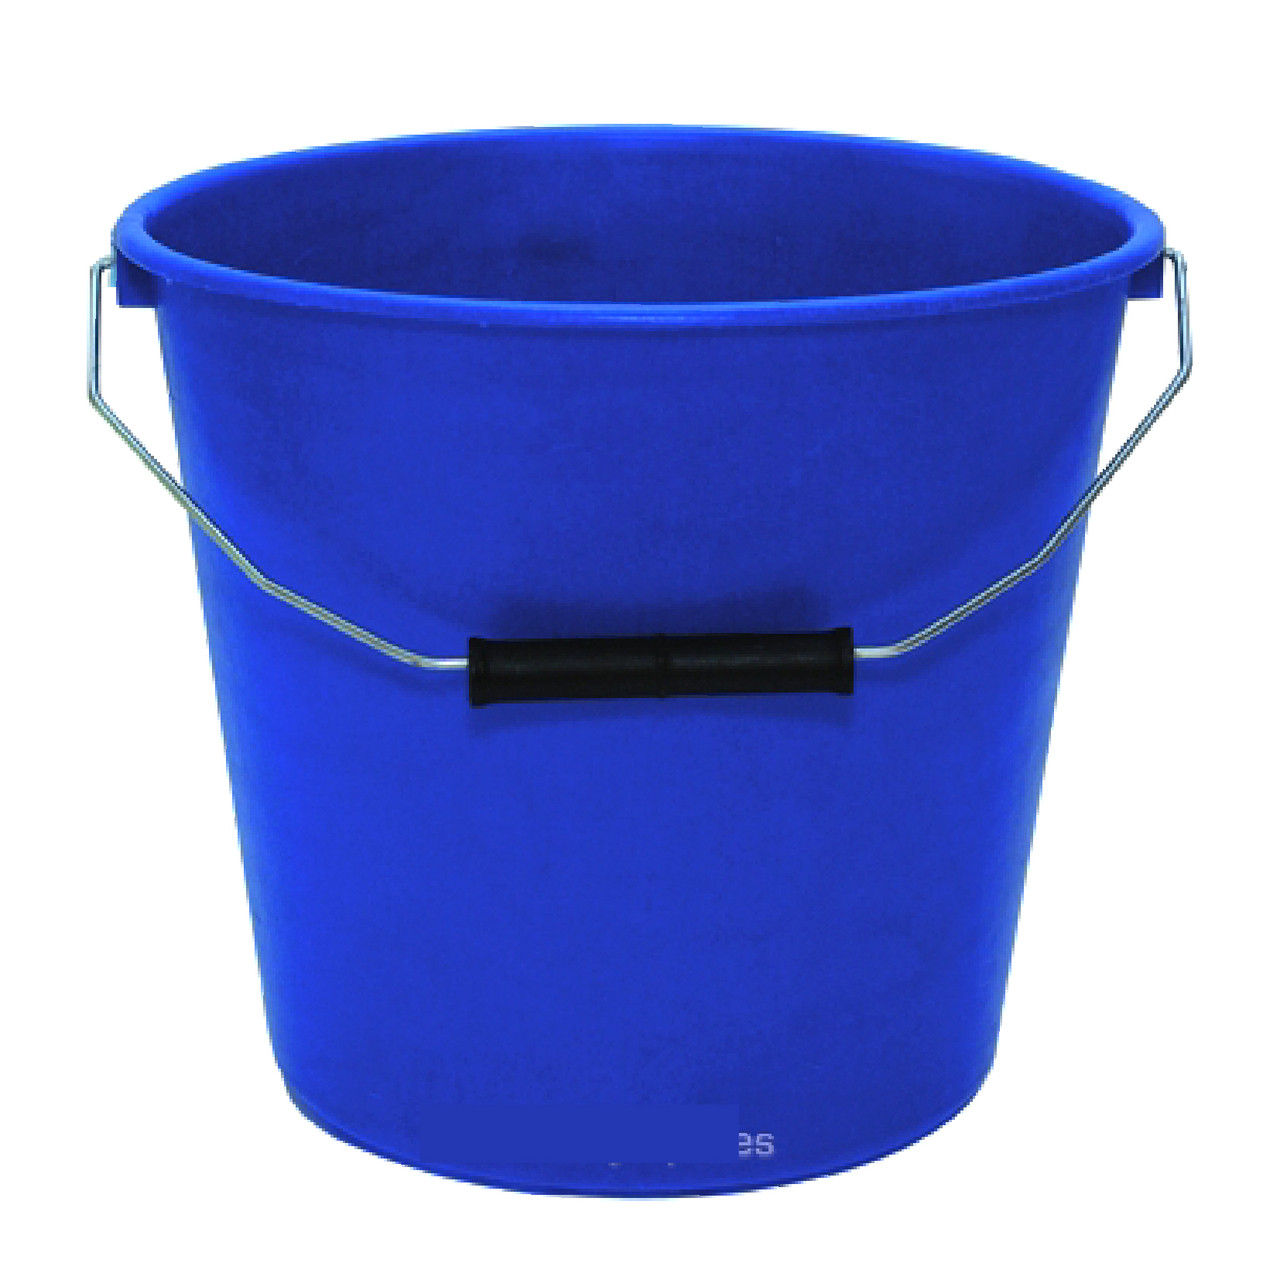 Calf Feeding Bucket 5 litre - Homestead Farm Supplies  |Bucket Calves